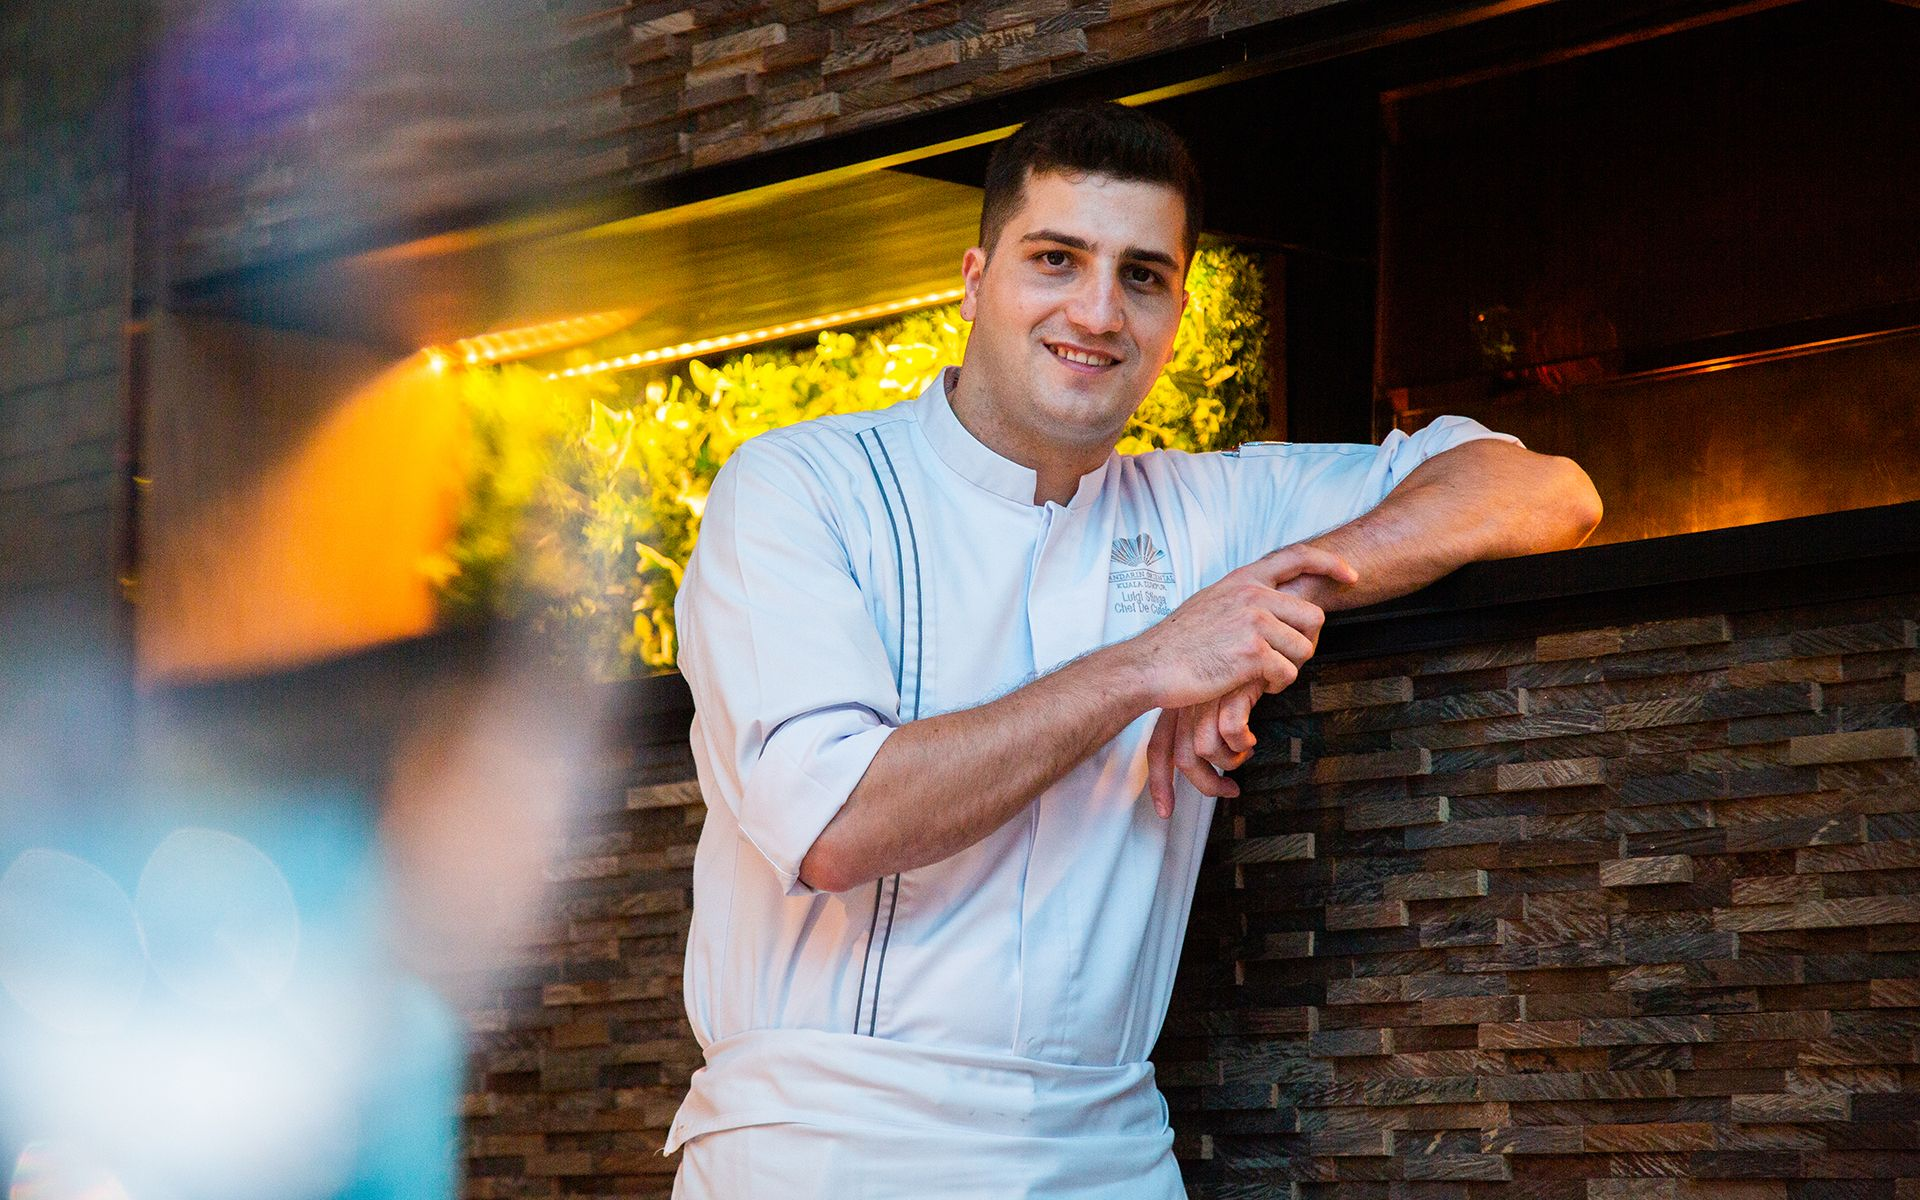 Chef Luigi Stinga's Mandarin Oriental KL Debut Is An Ode To His Italian Childhood